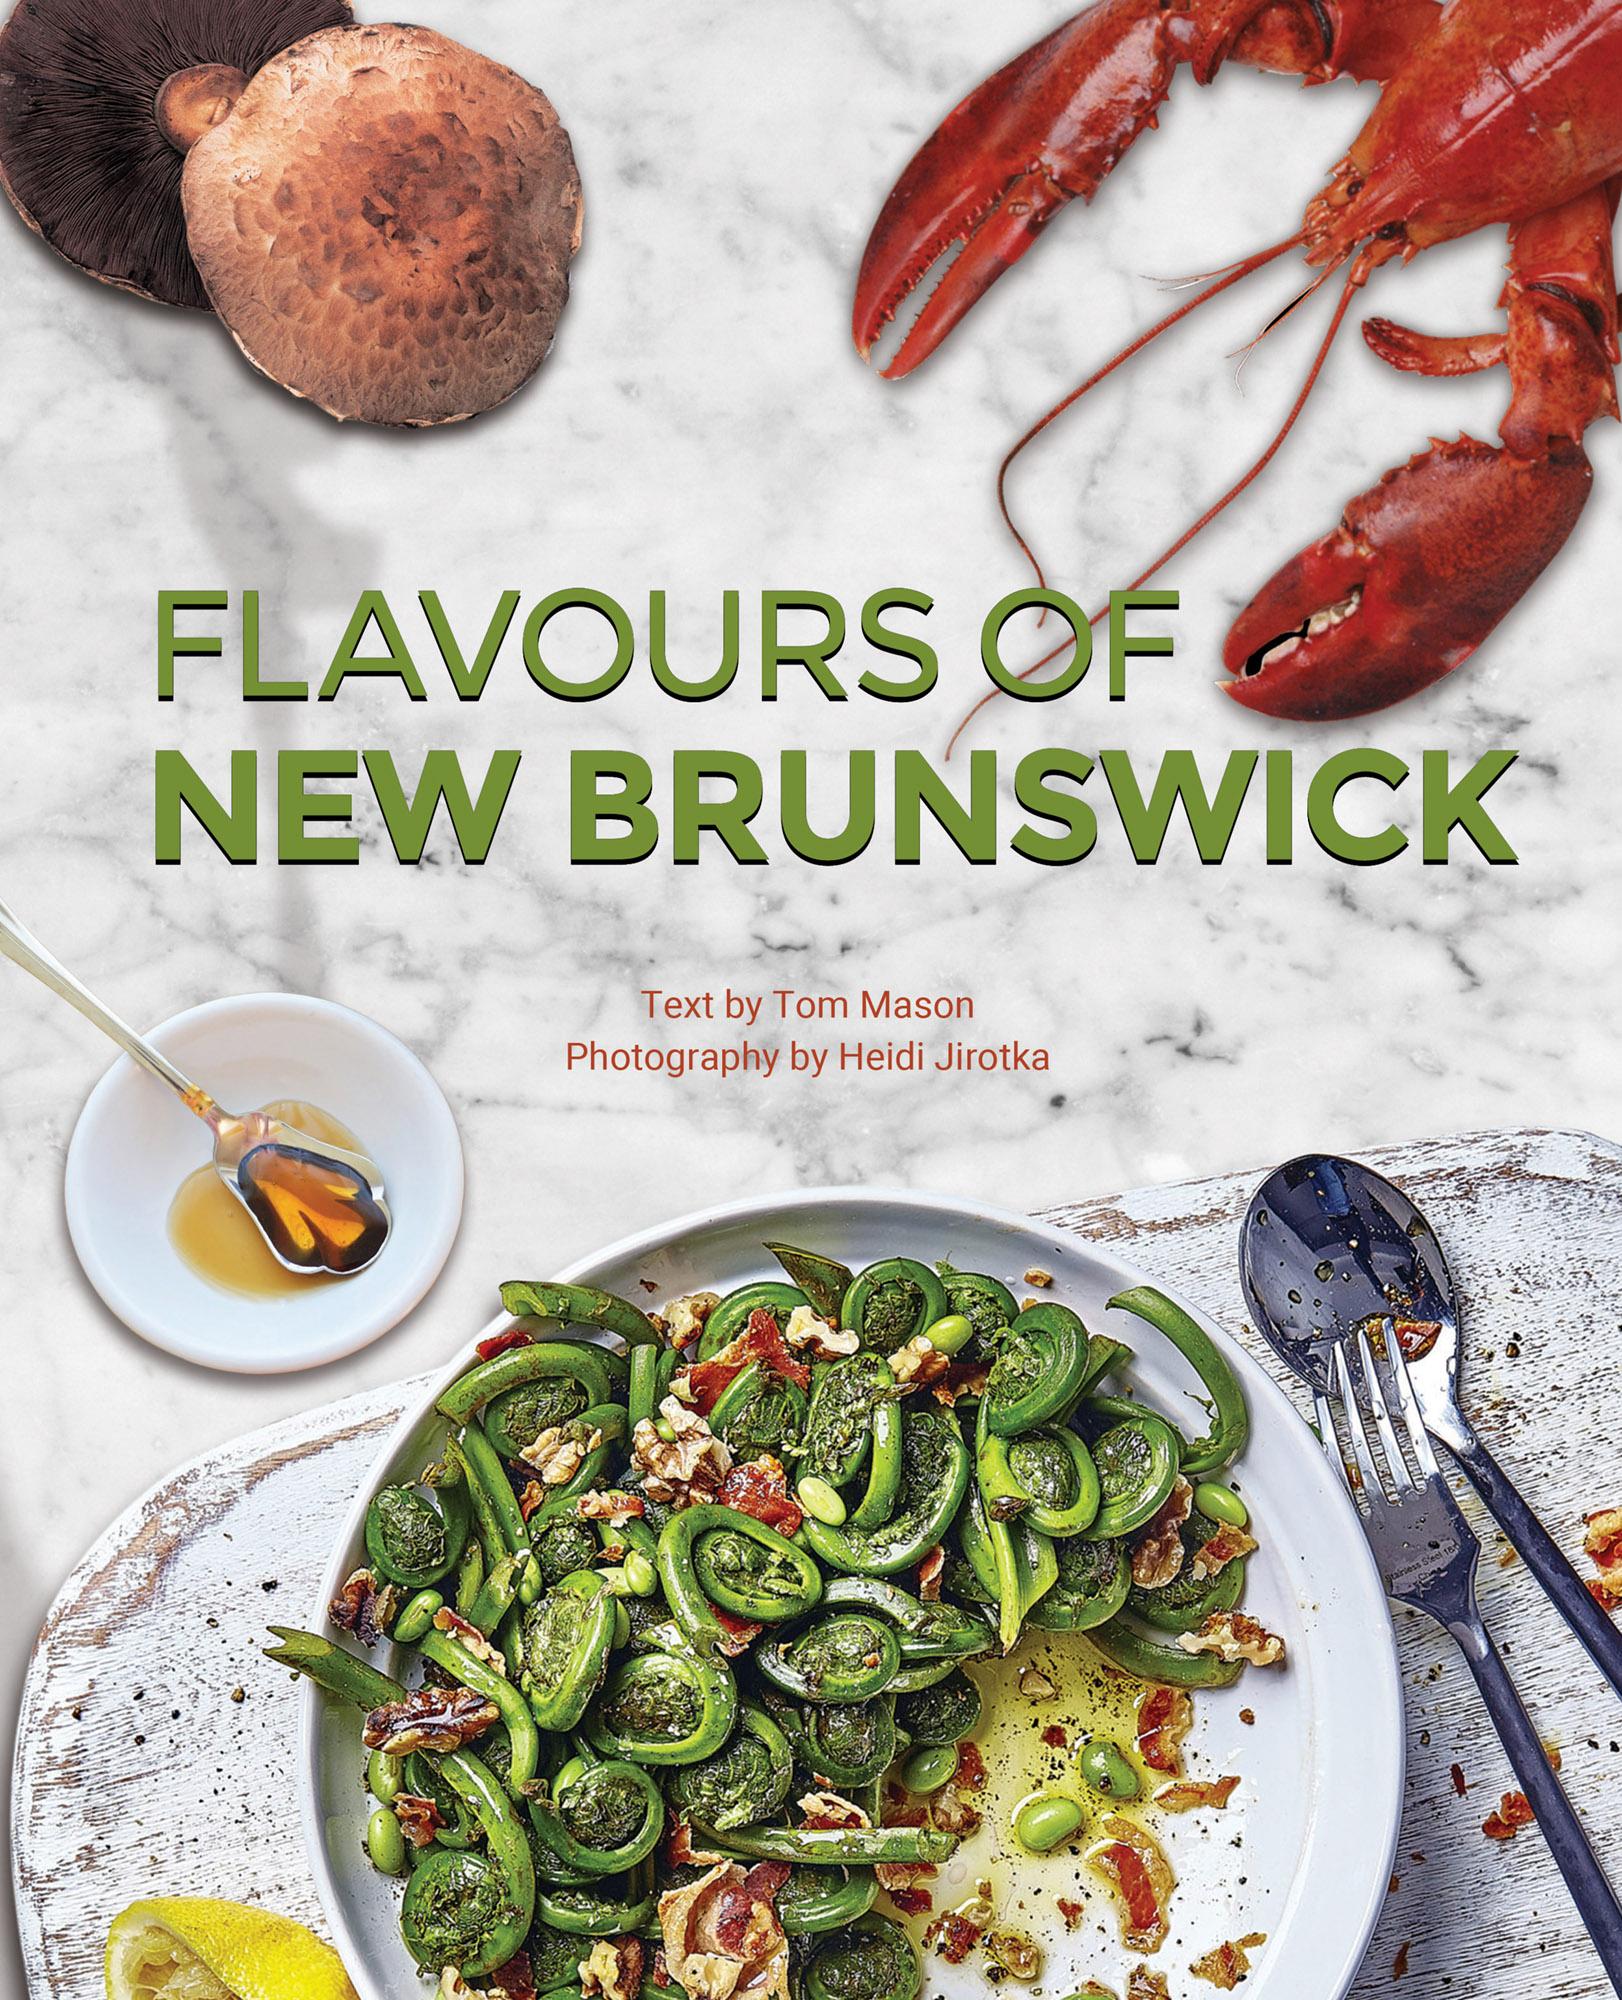 Flavours of New Brunswick